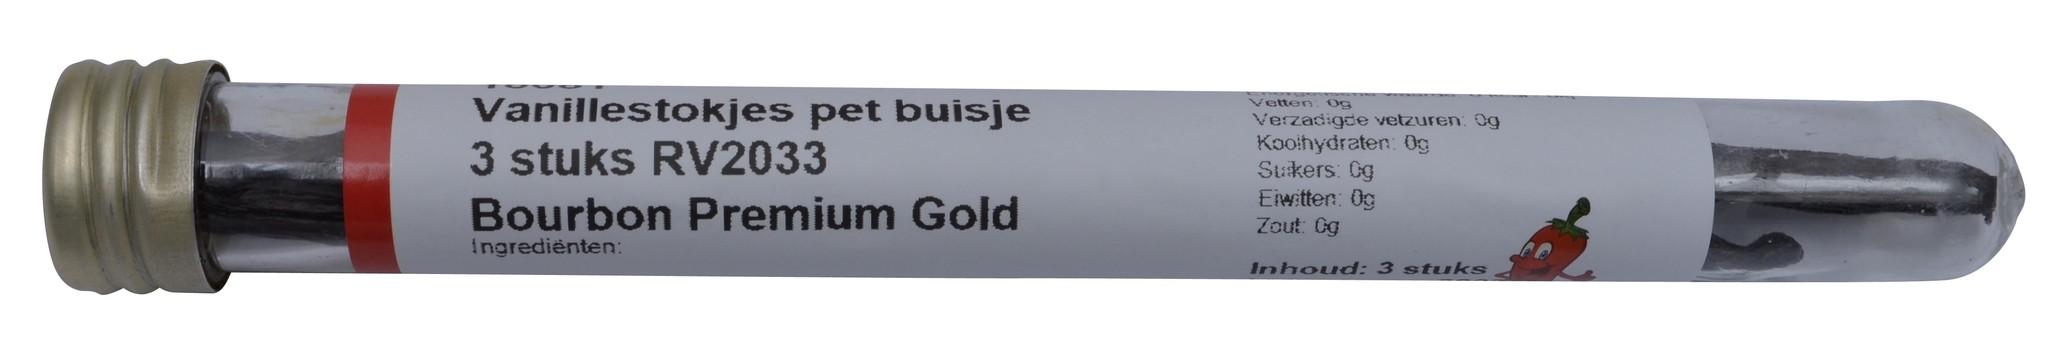 Vanillestokjes Bourbon Premium Gold